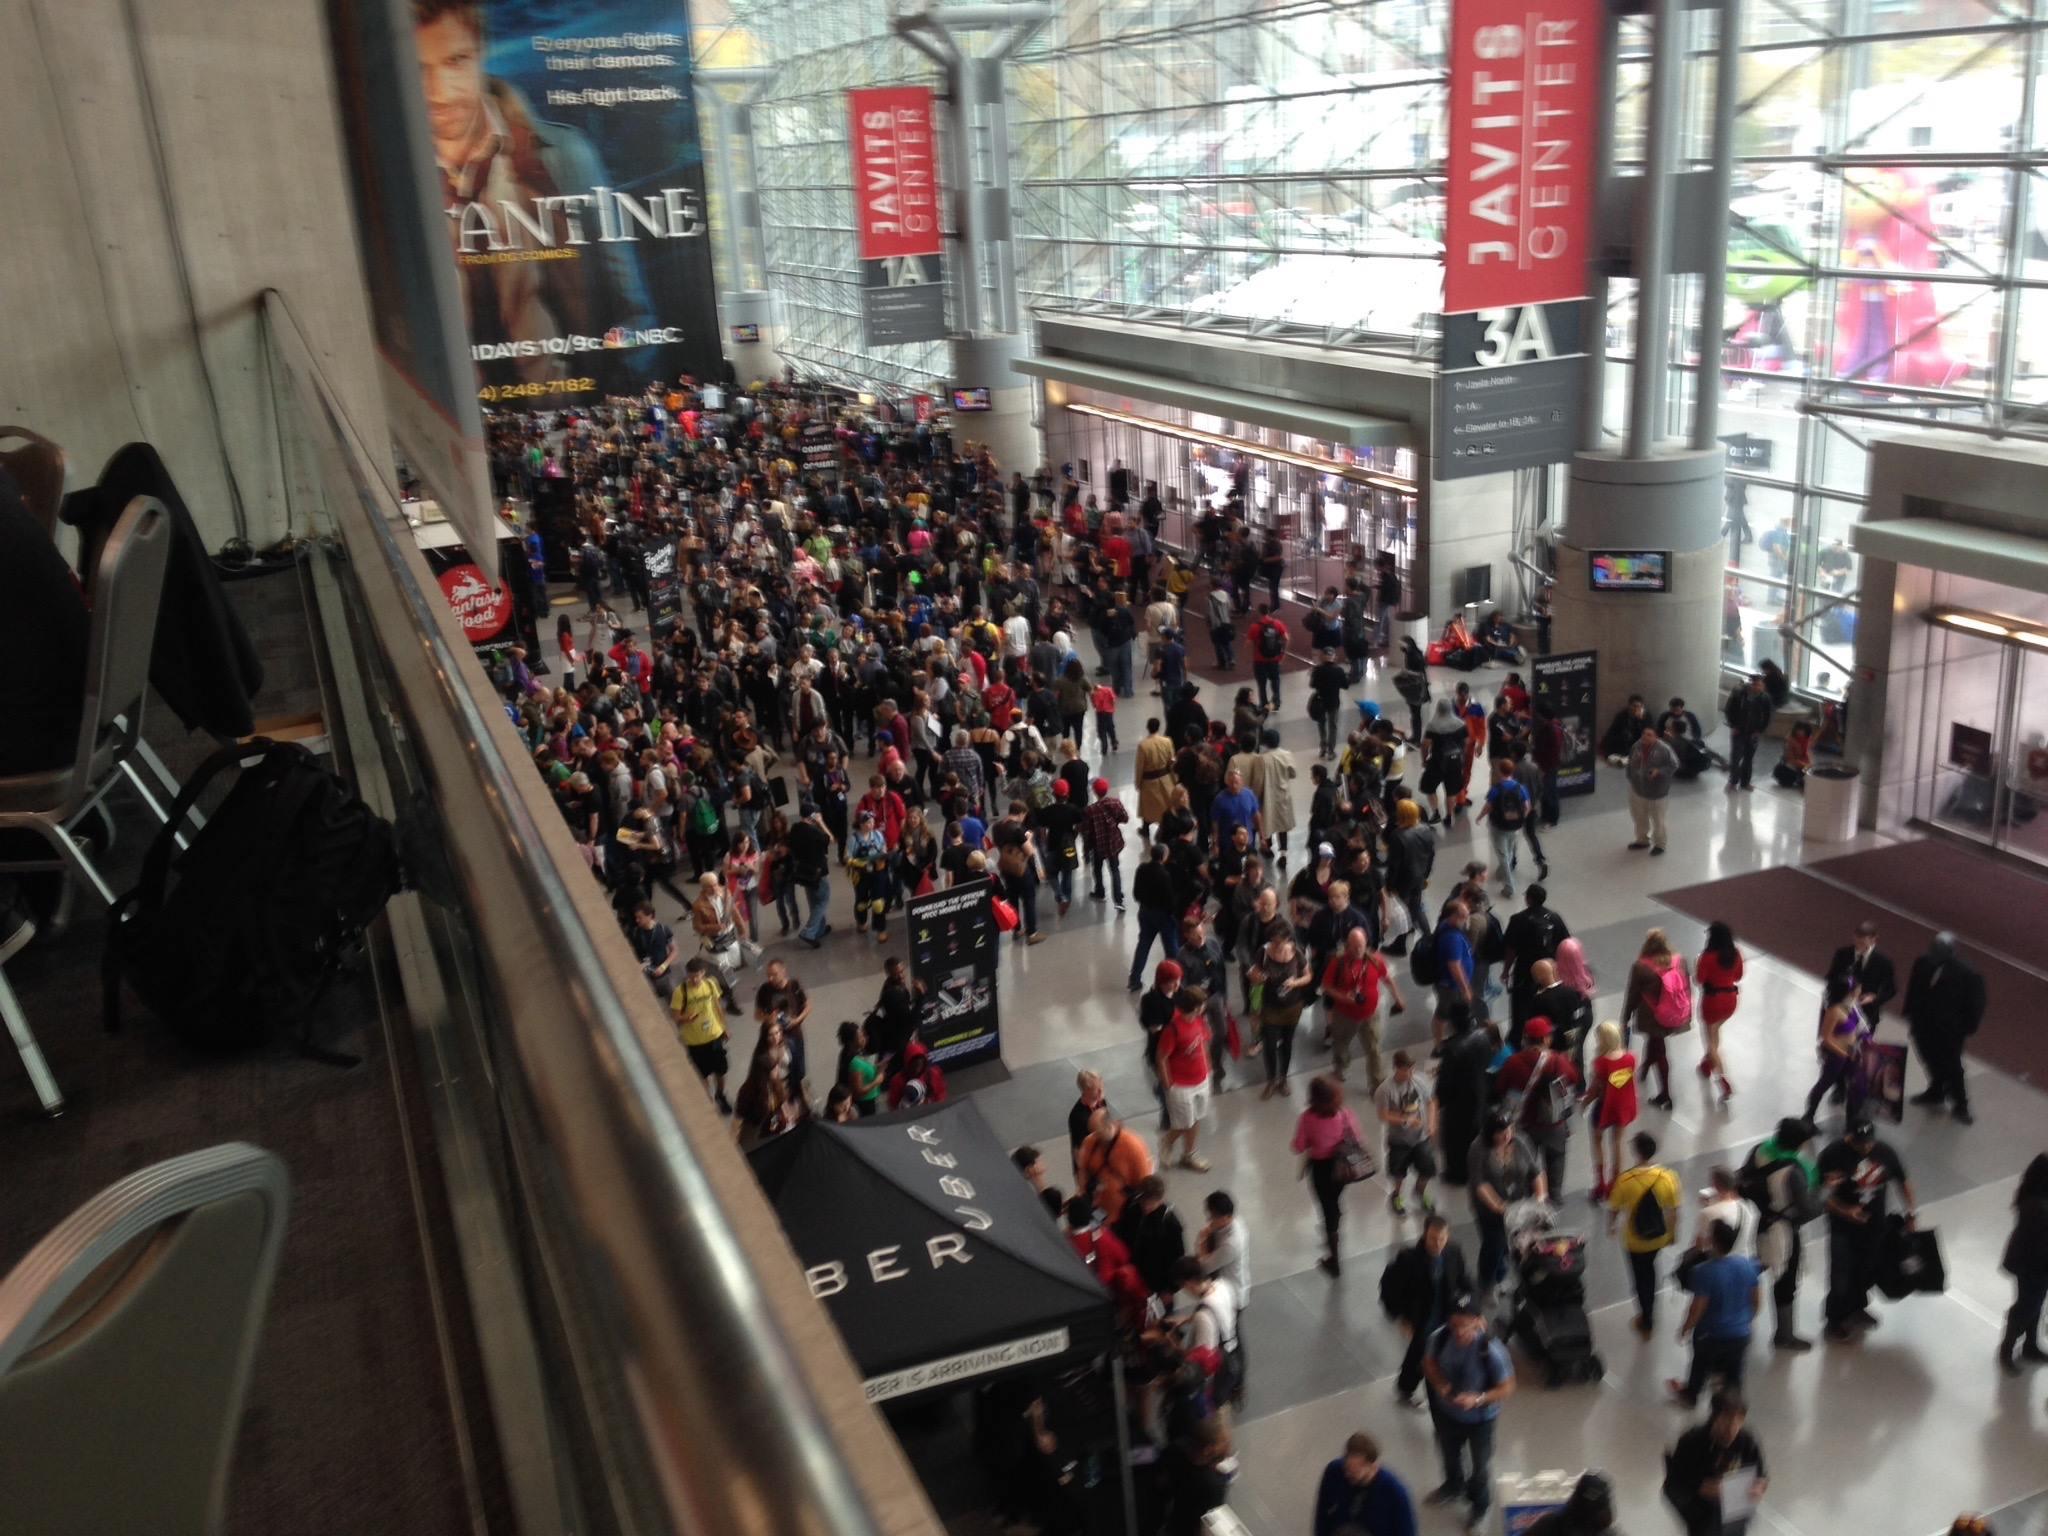 150,00 people through tis weekend - bigger than San Diego Con?